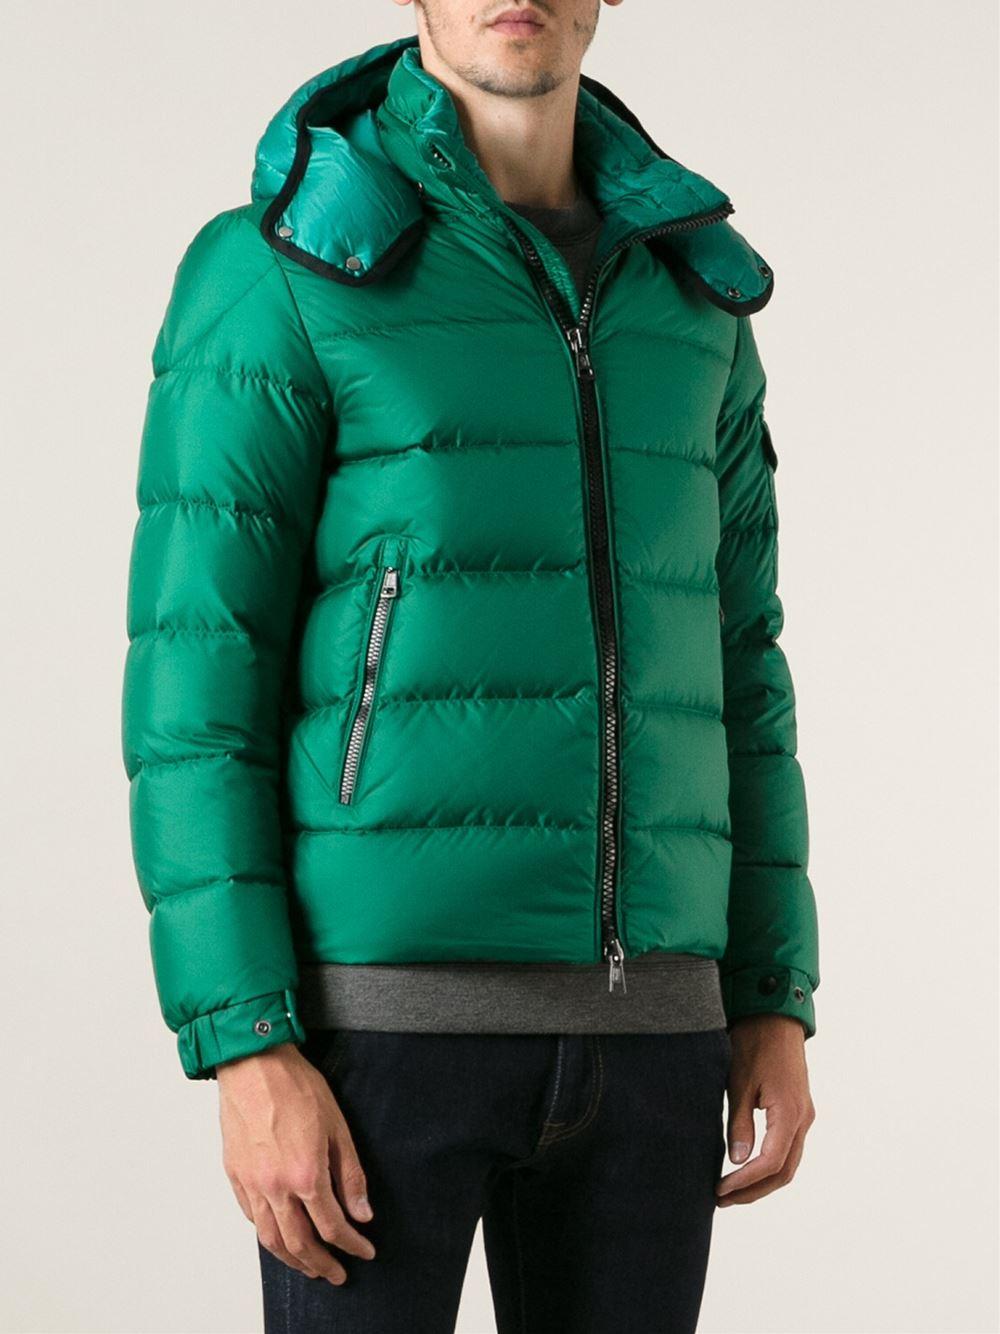 moncler green jacket